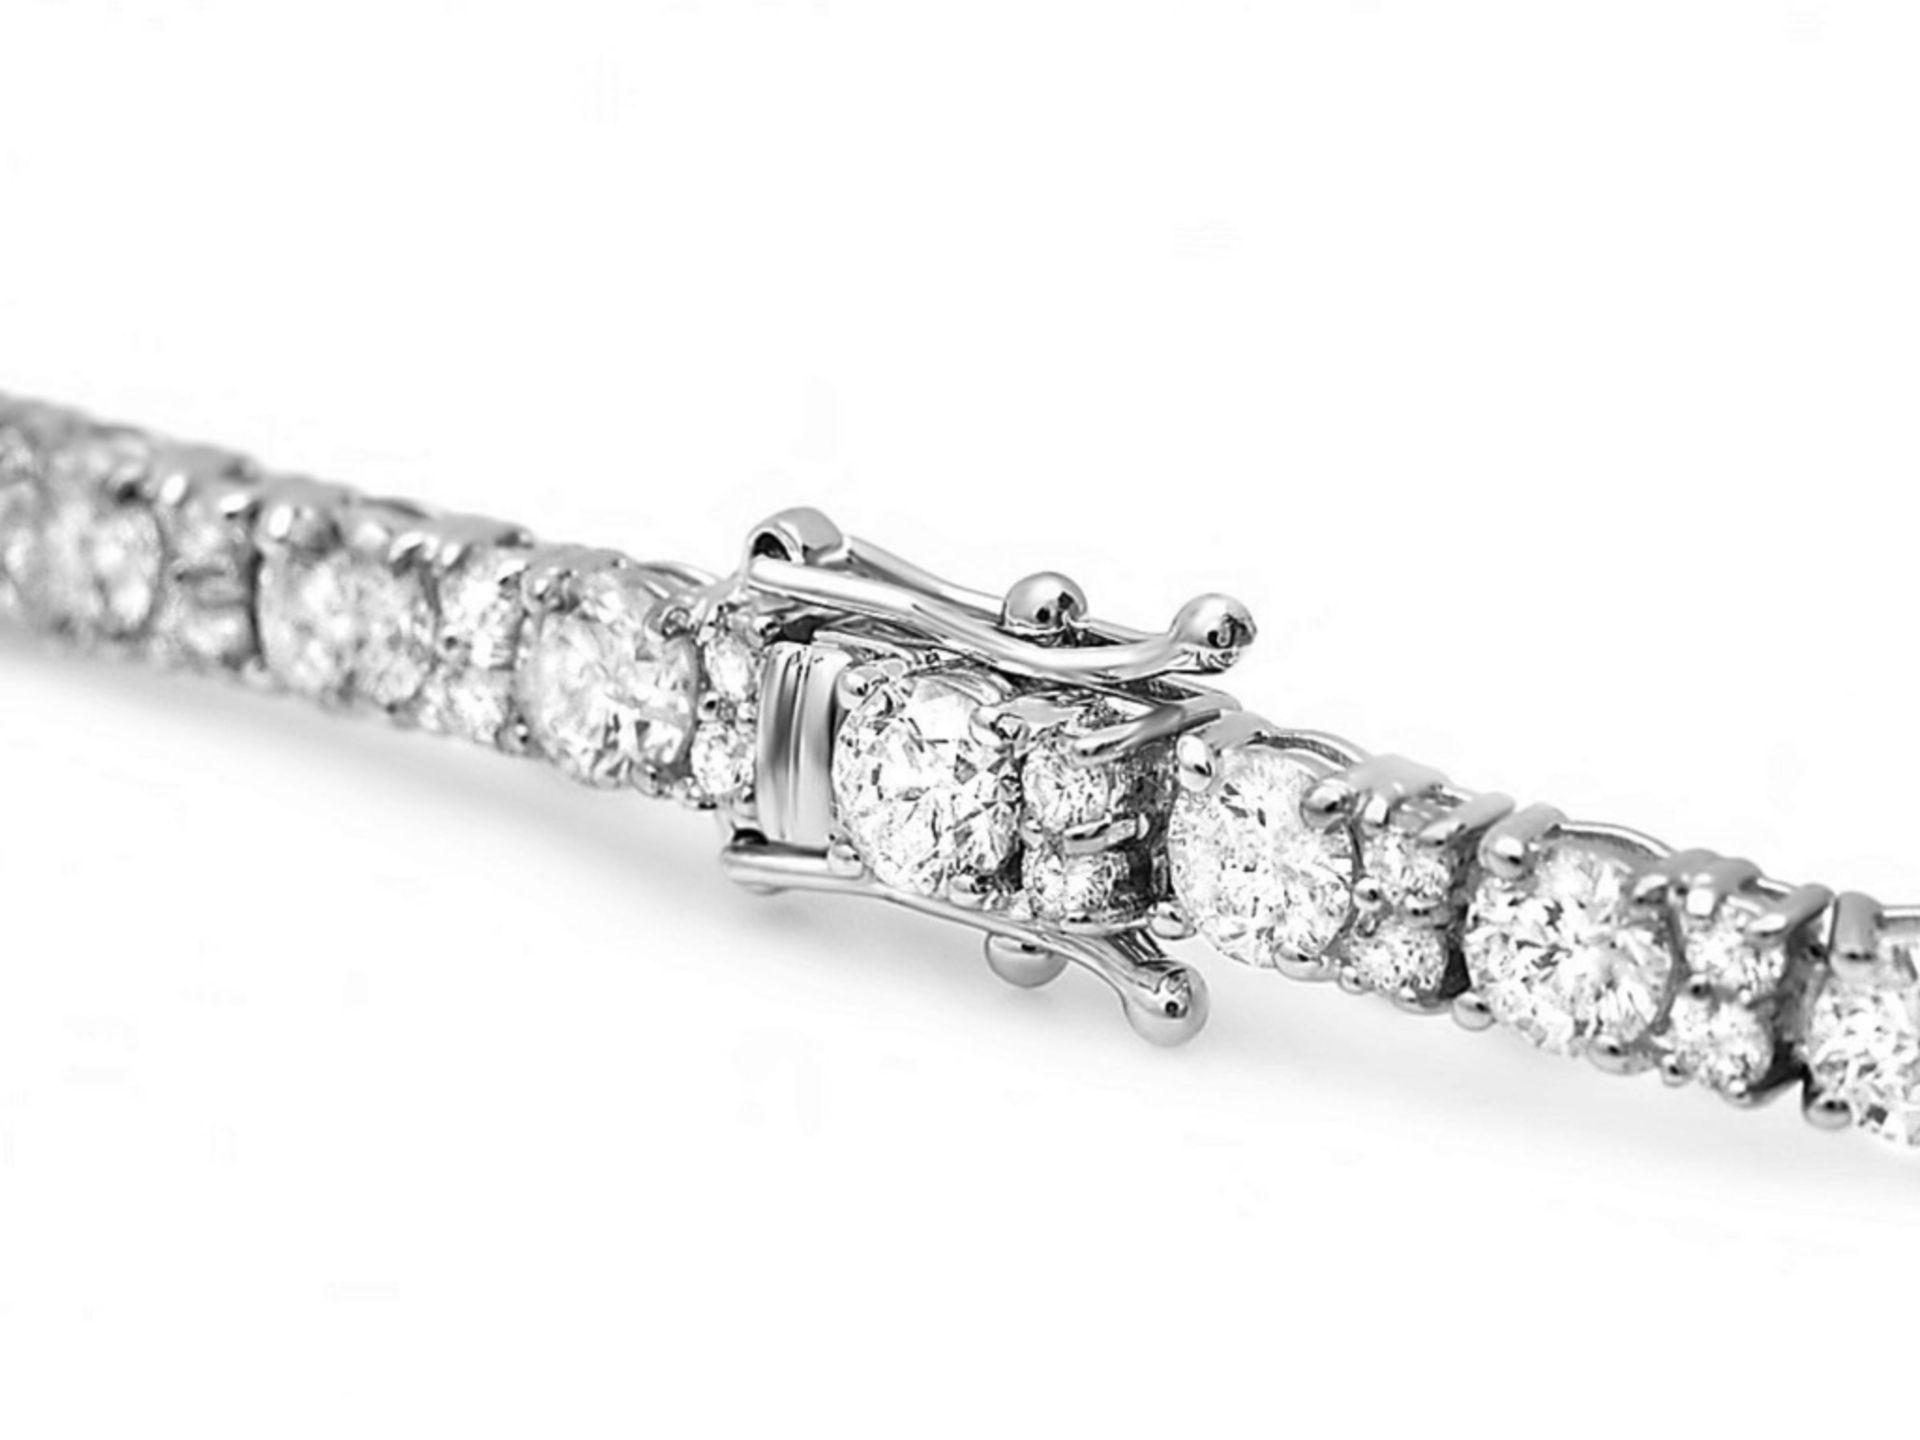 ^18k White Gold 9.00ct Diamond Bracelet - Image 3 of 4